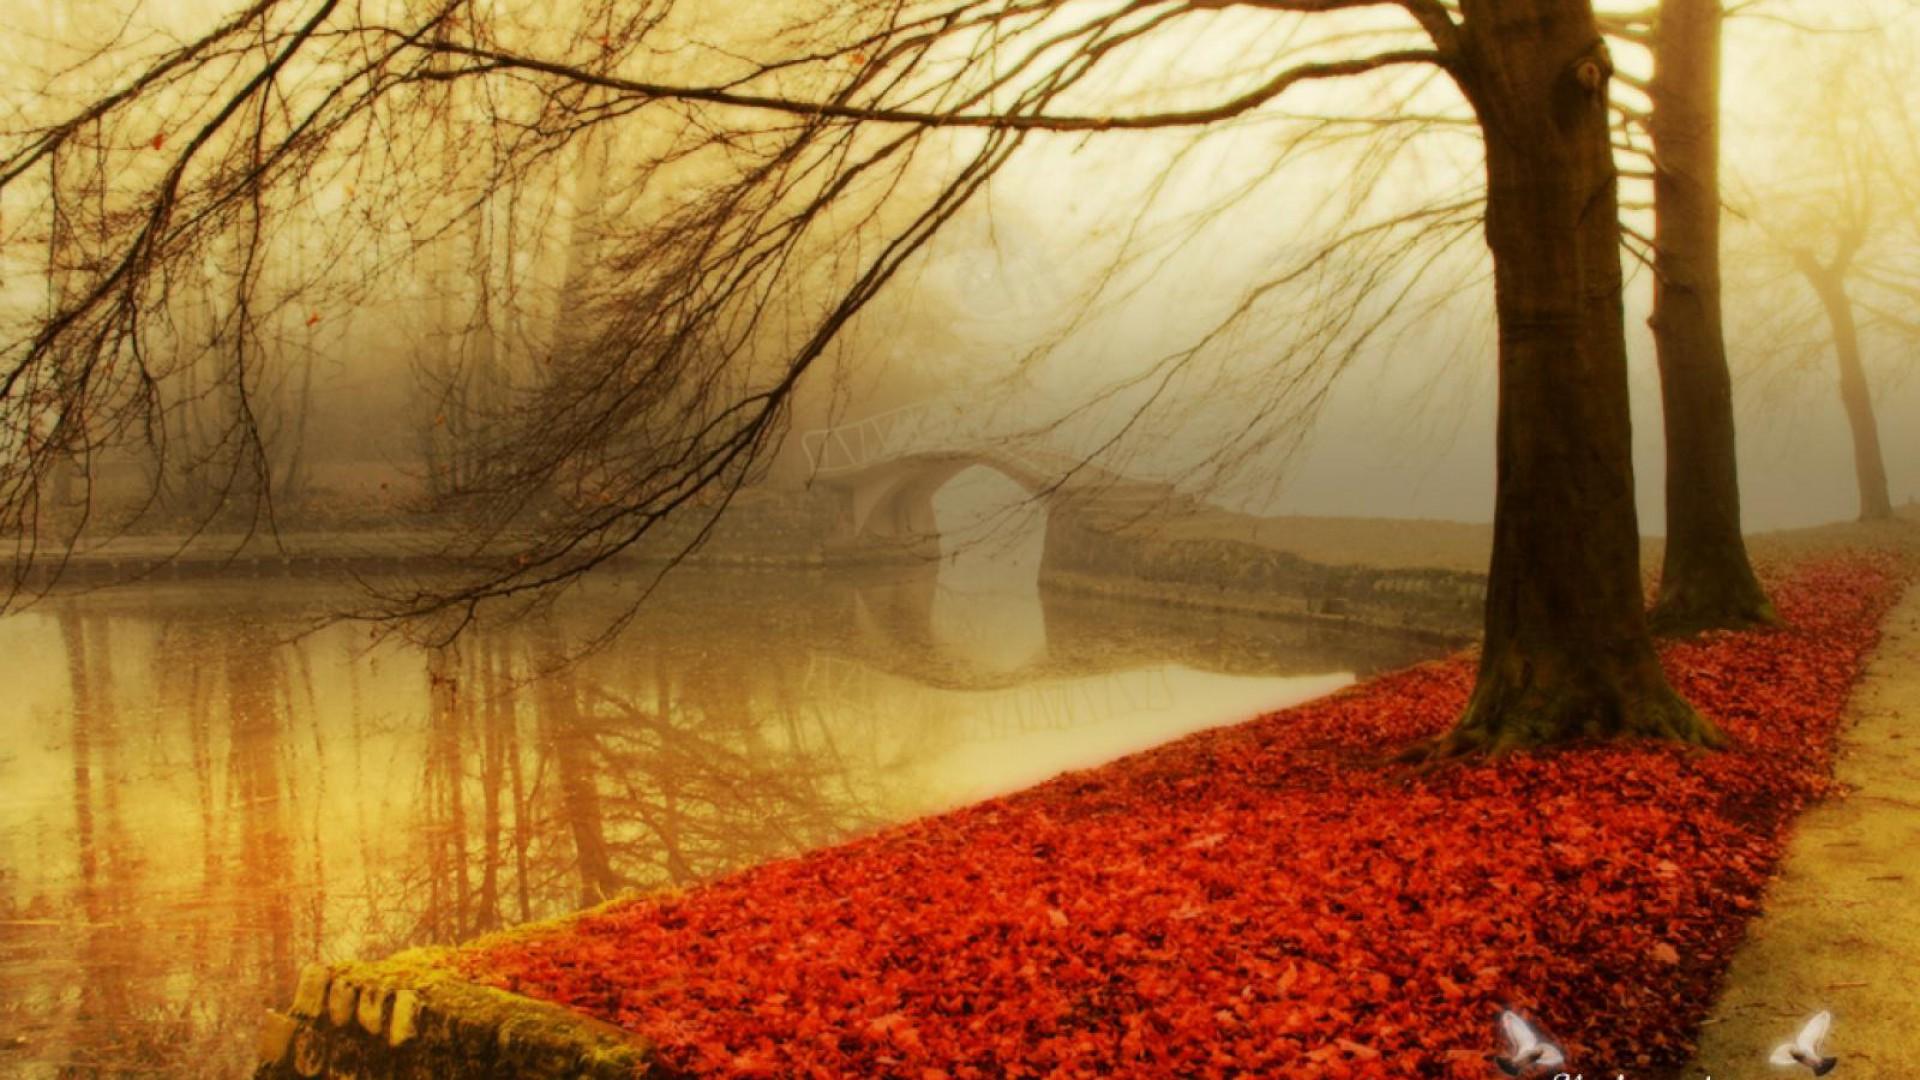 Abstract CIty Lake Hd Autumn Wallpapers Autumn Wallpaper